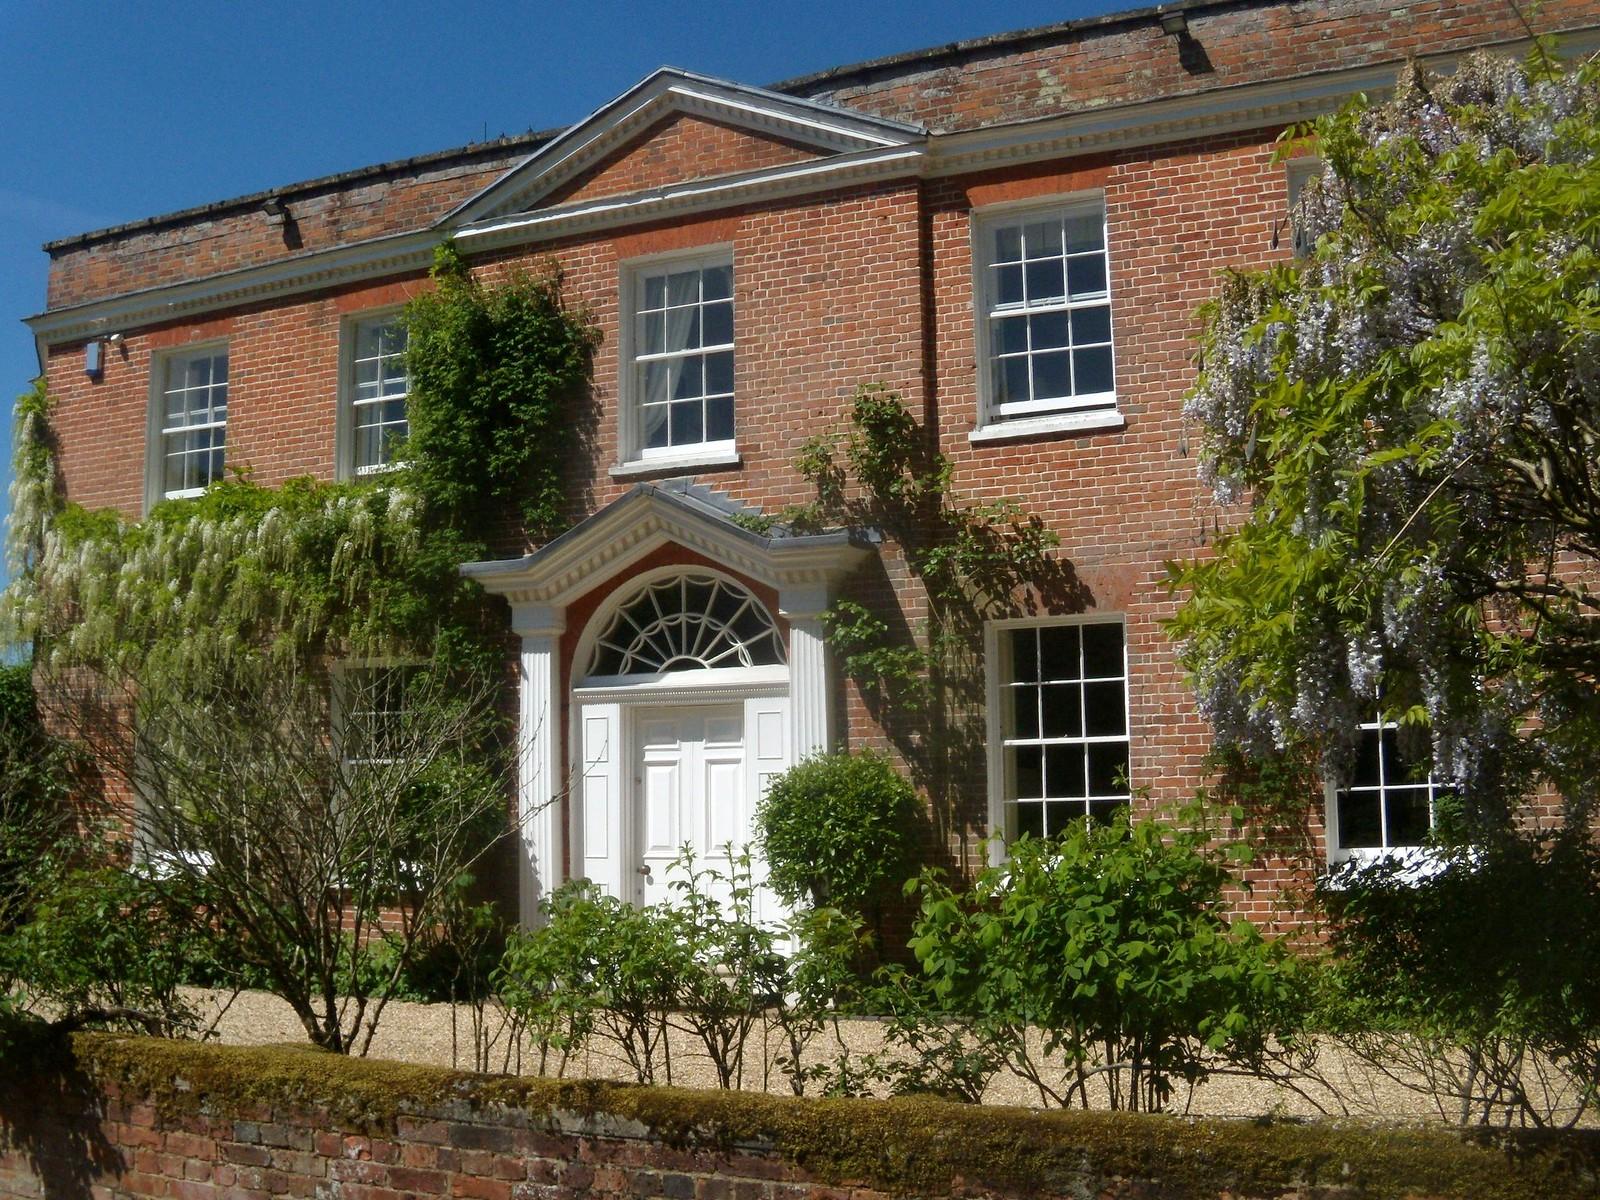 Ashe House Overton circular Home of Jane Austen's aunt